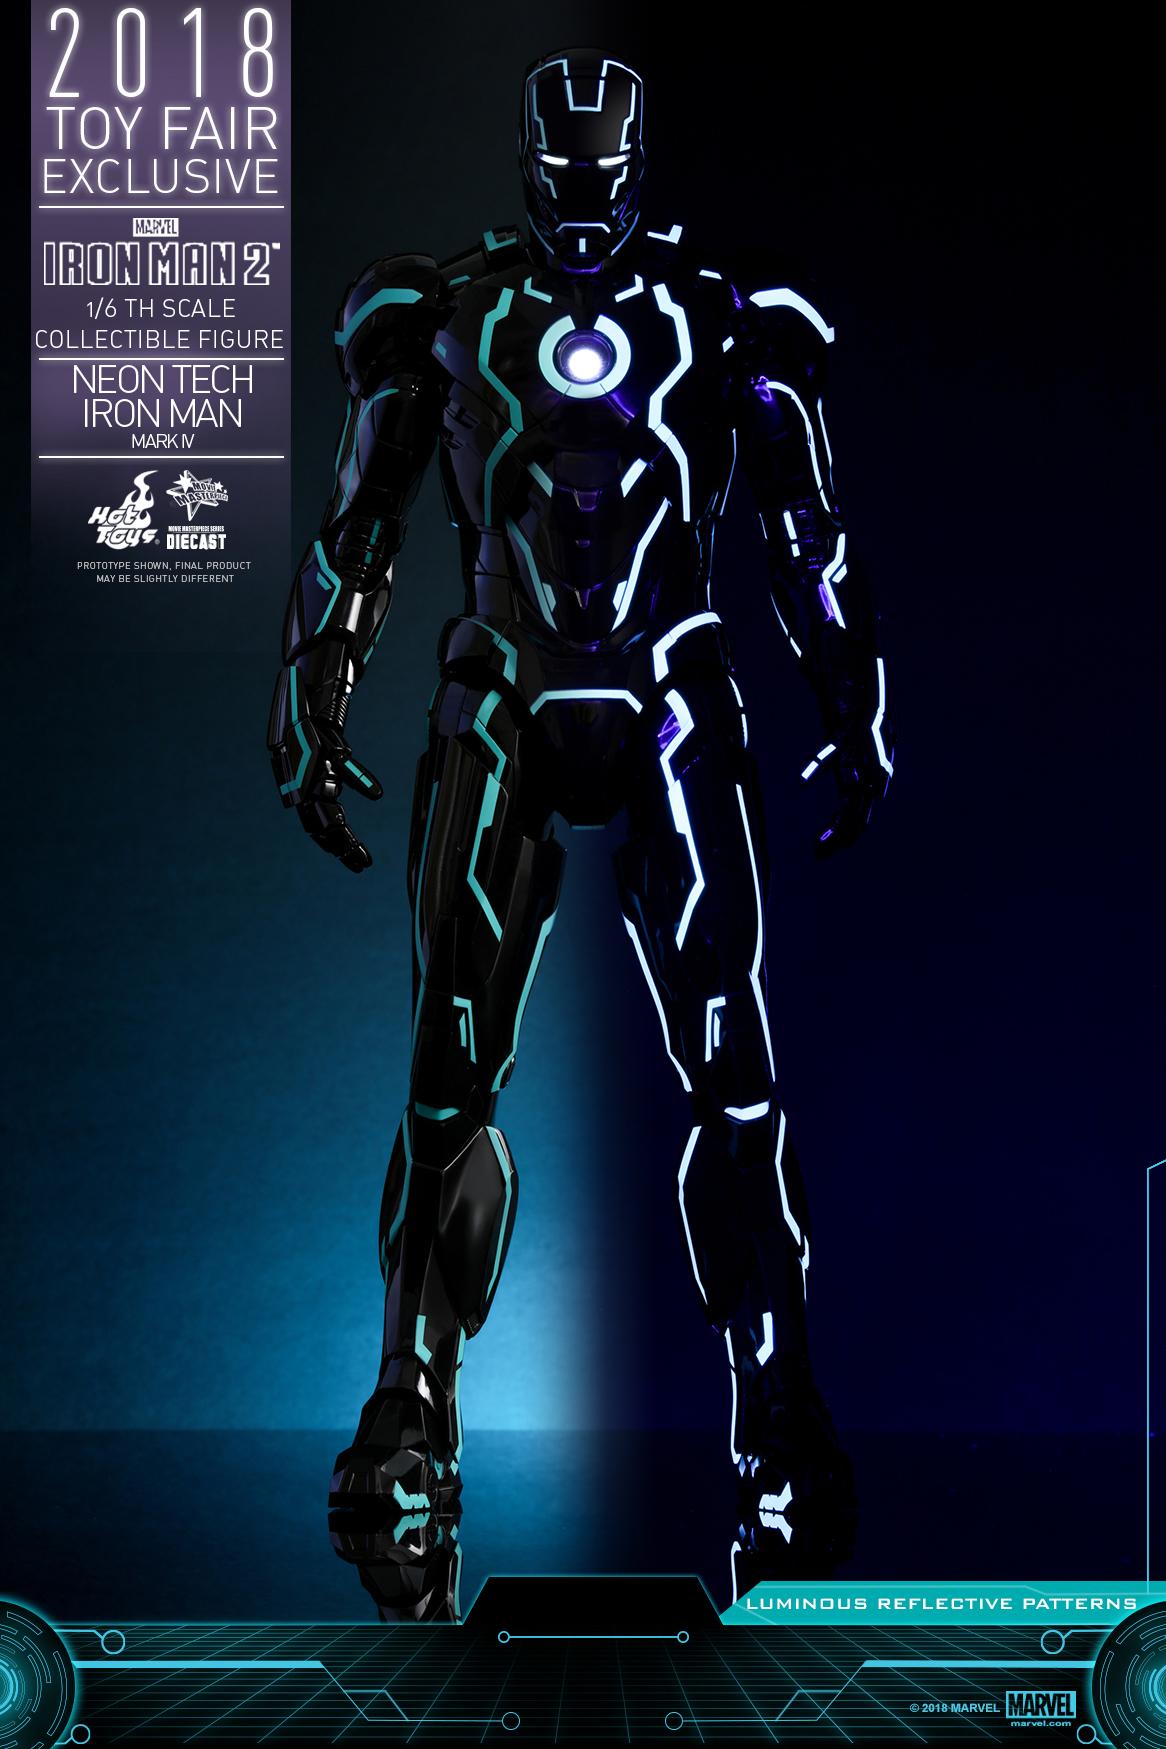 Hot Toys - Iron Man 2 - Neon Tech Iron Man Mark IV collectible figure_PR3